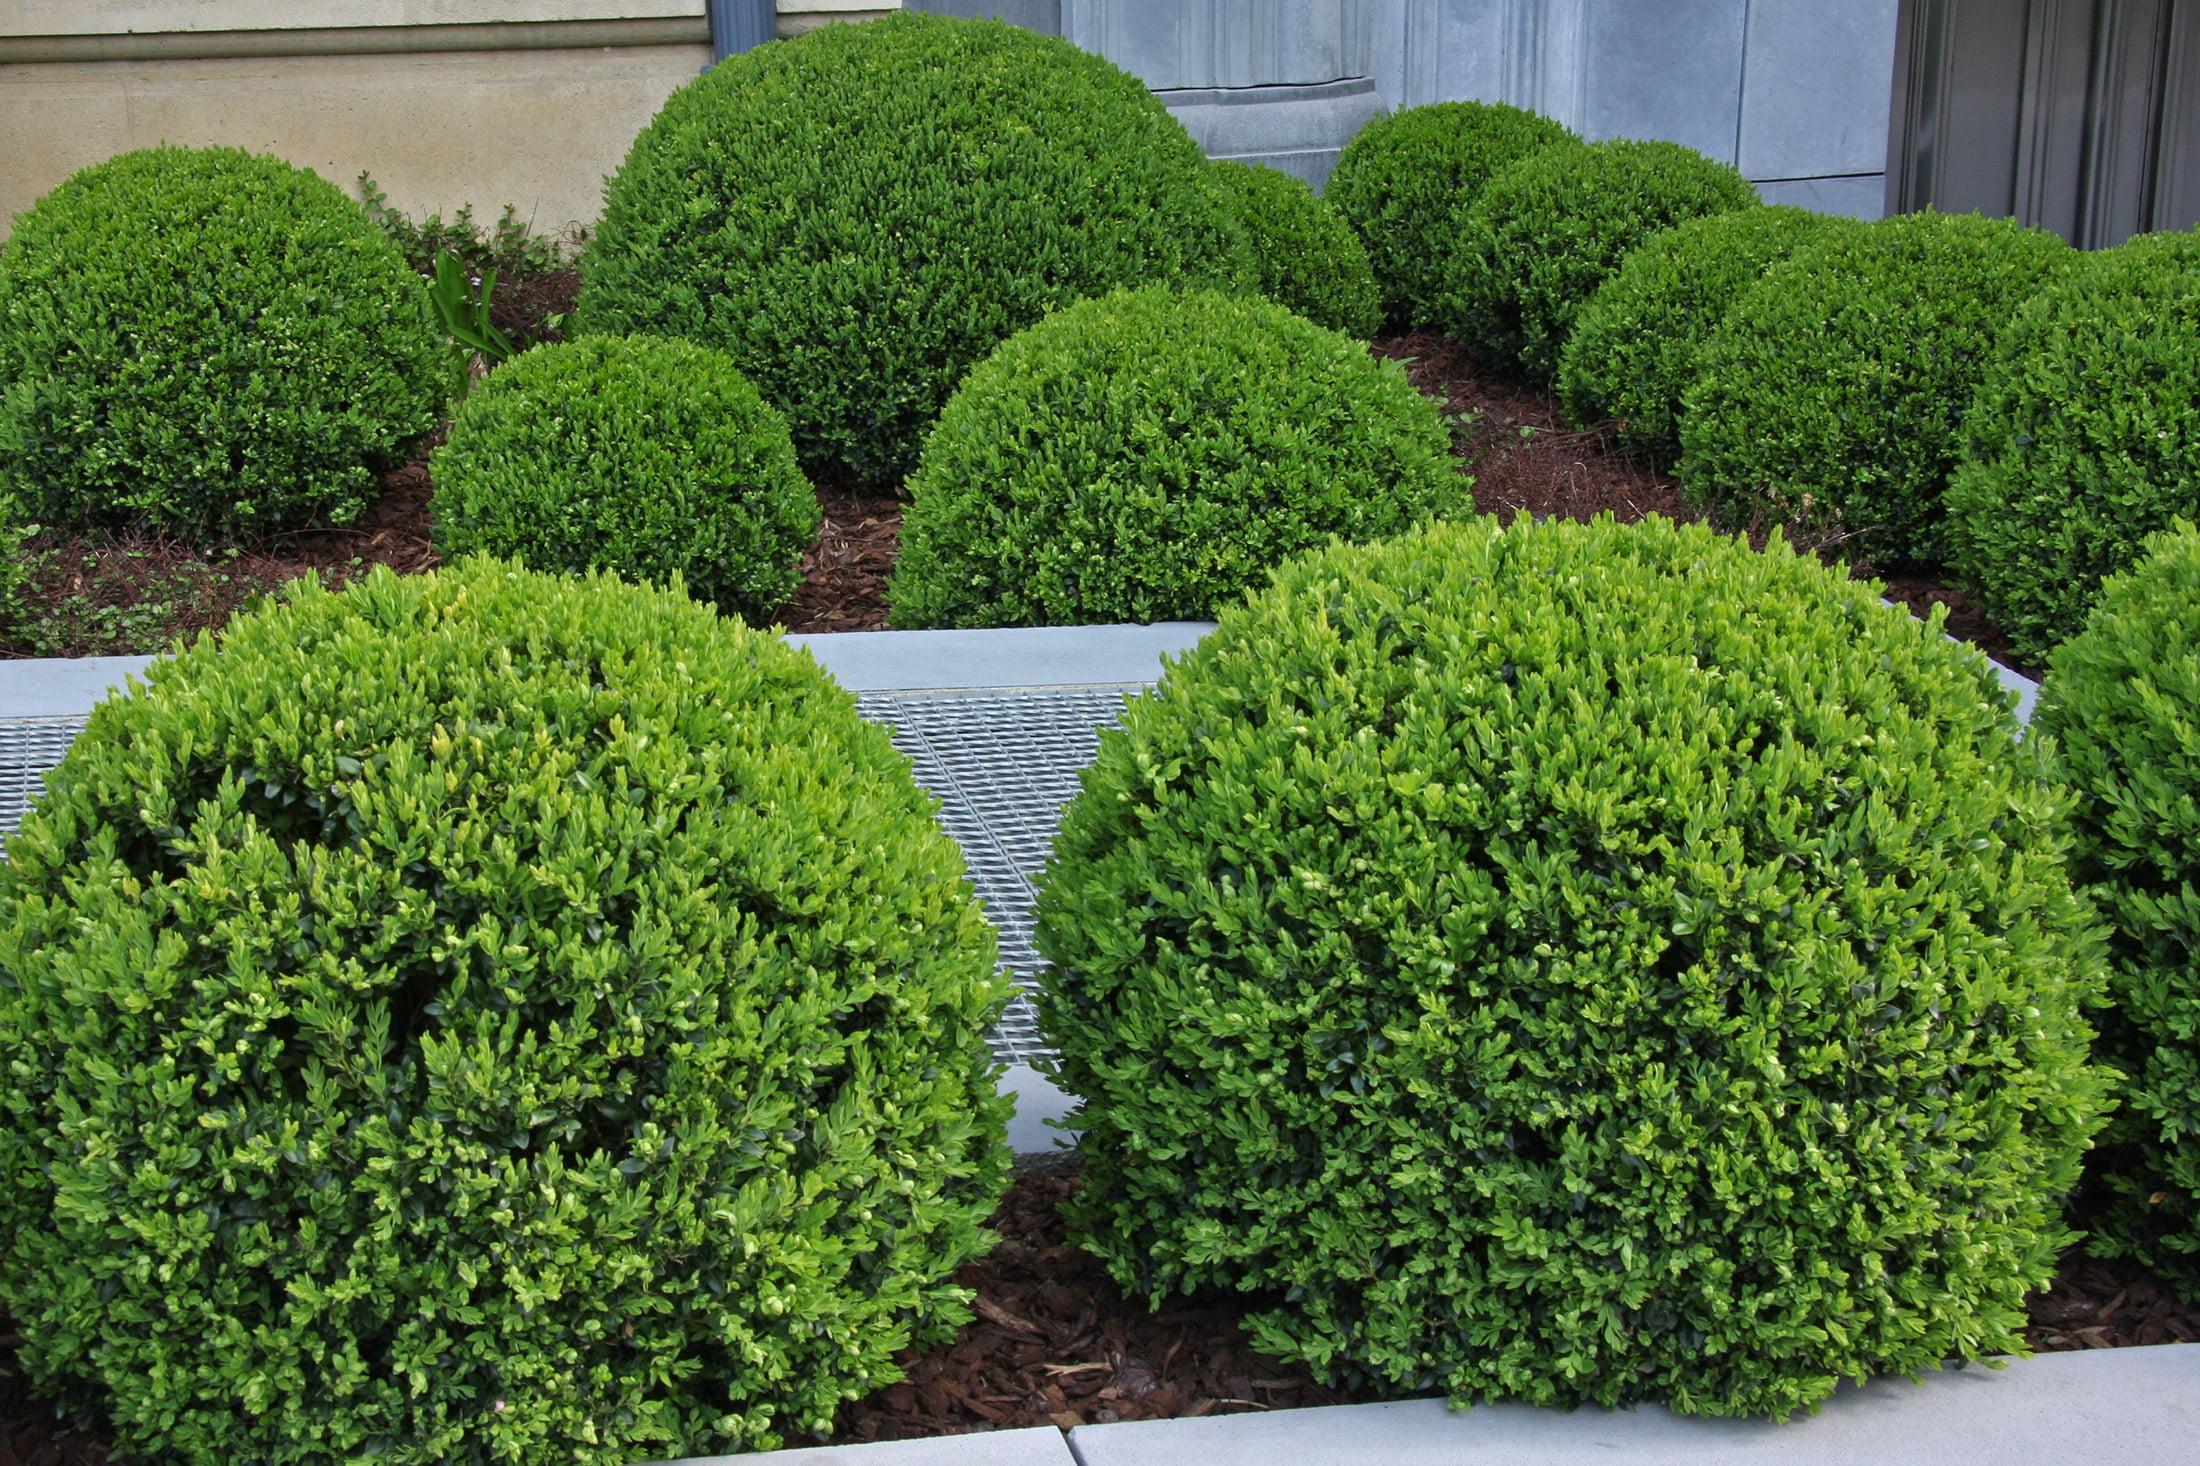 Keeping box plants healthy